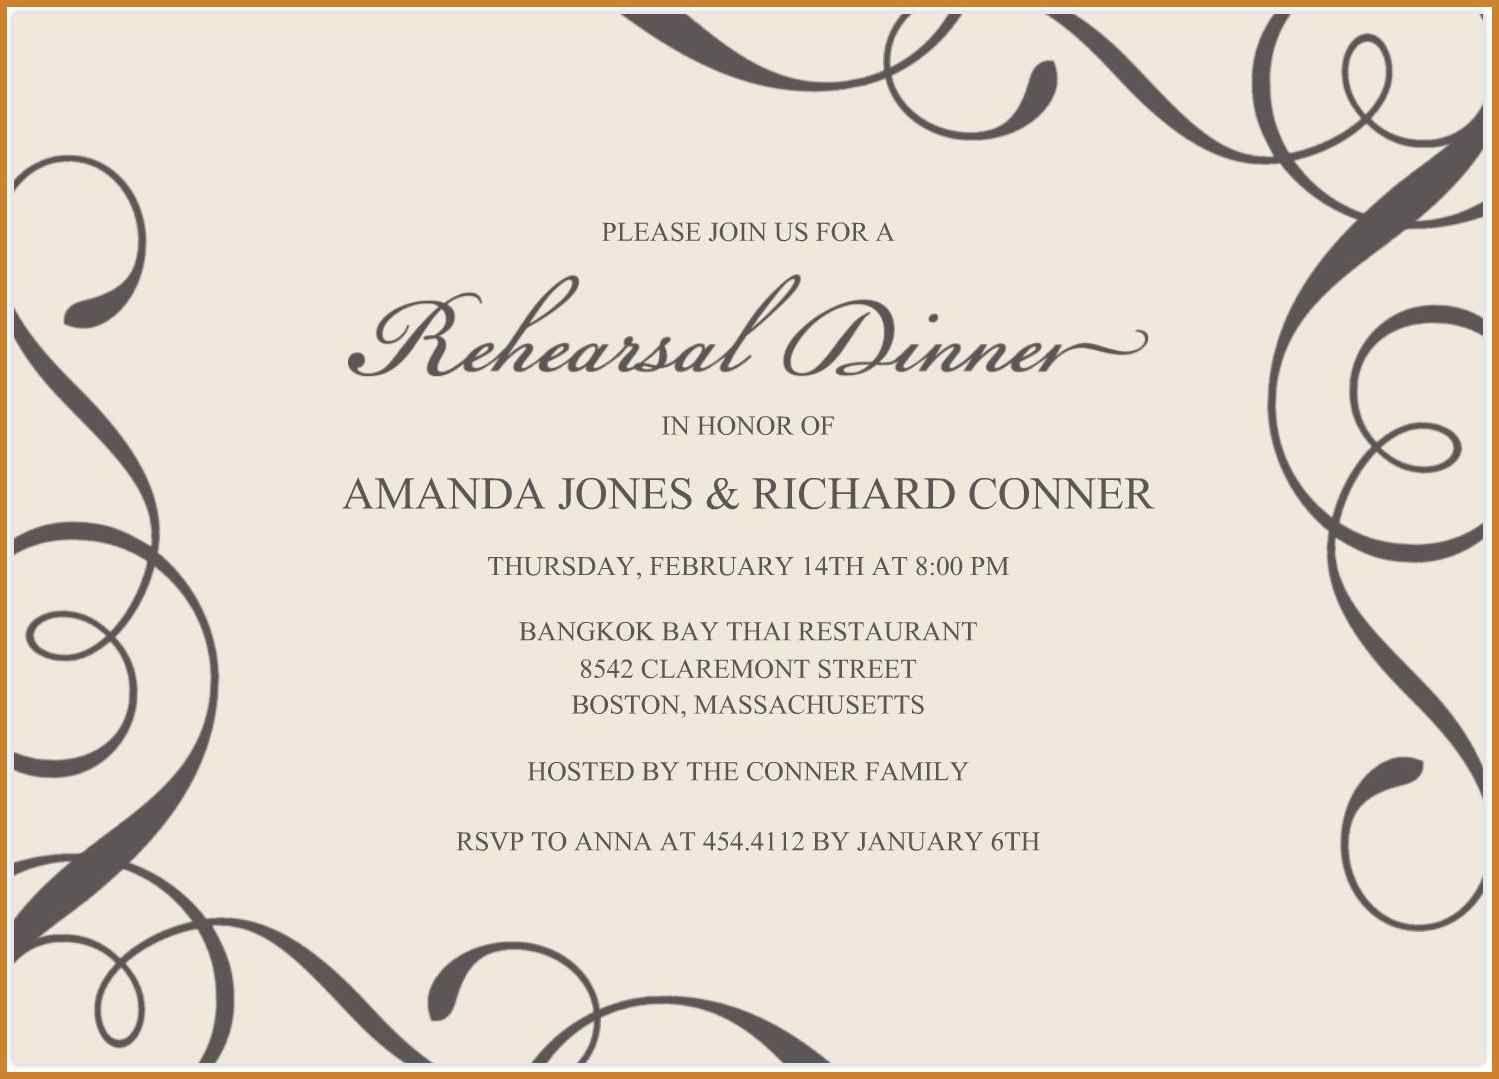 Invitation Designs Free Download Wedding Invitation Templates Free Download The True Meaning Of .